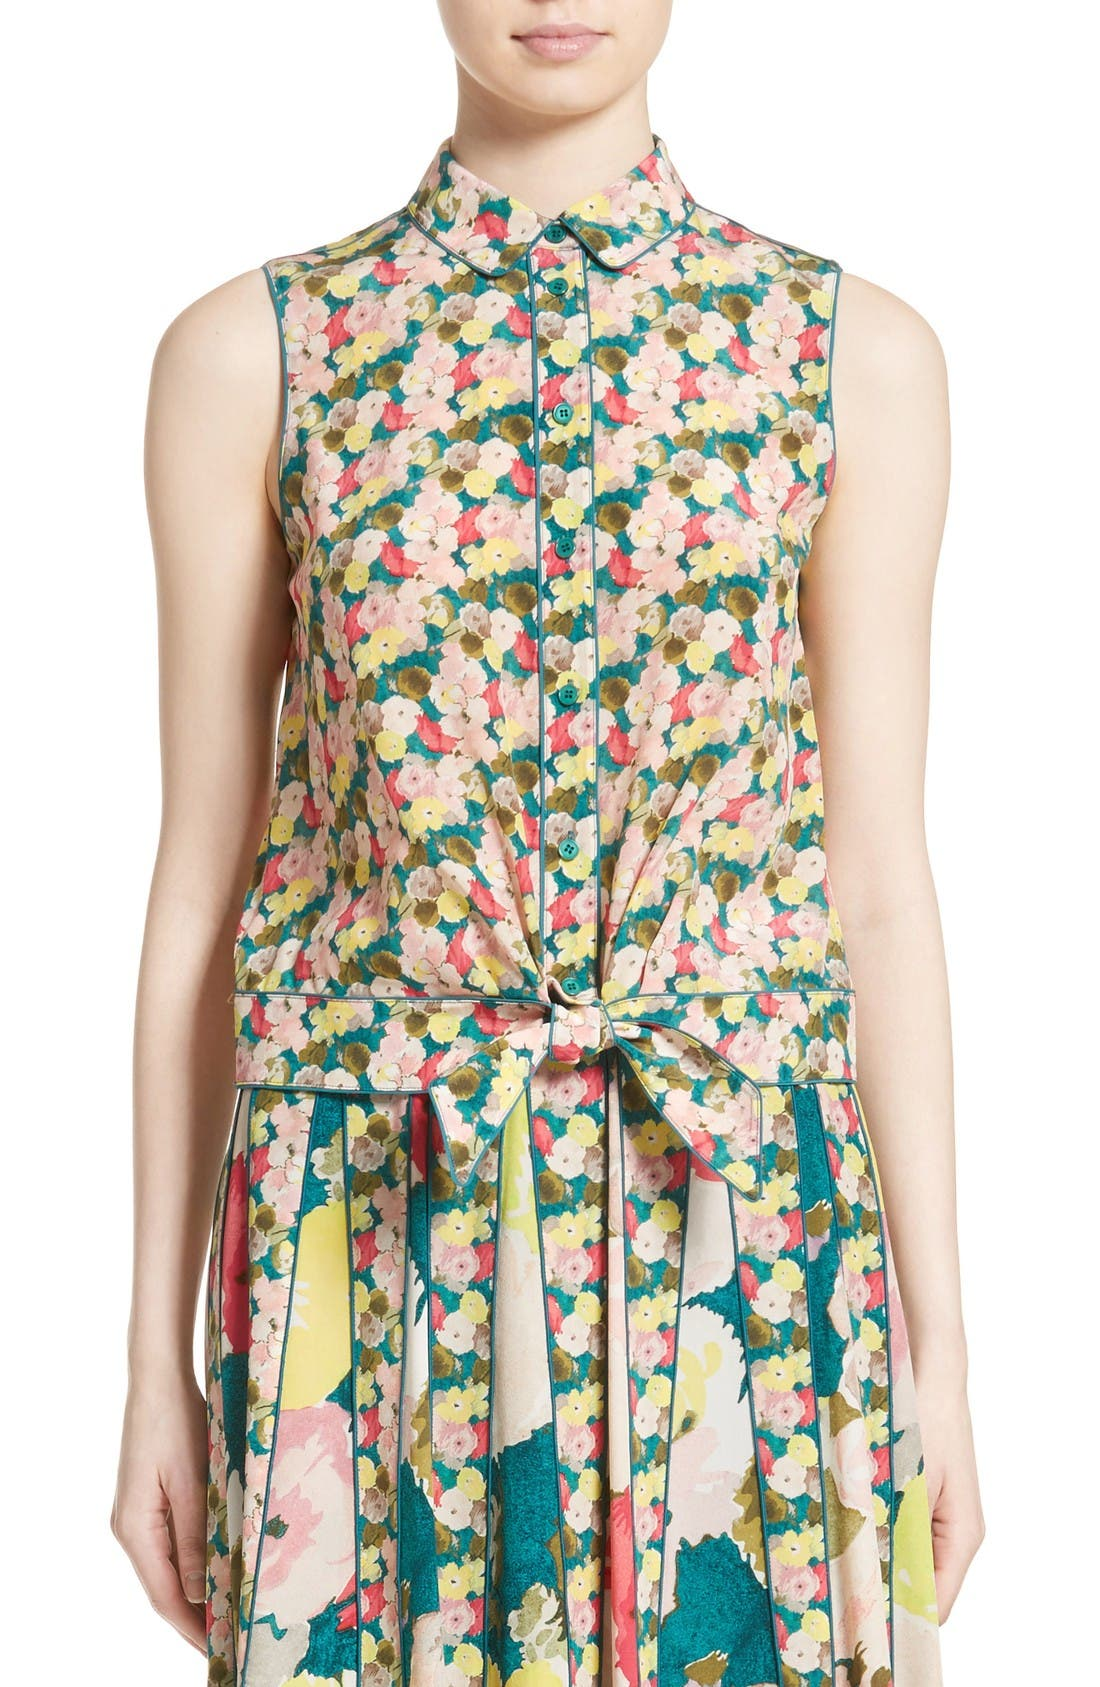 Alternate Image 1 Selected - Lafayette 148 New York Tisha Floral Silk Blouse